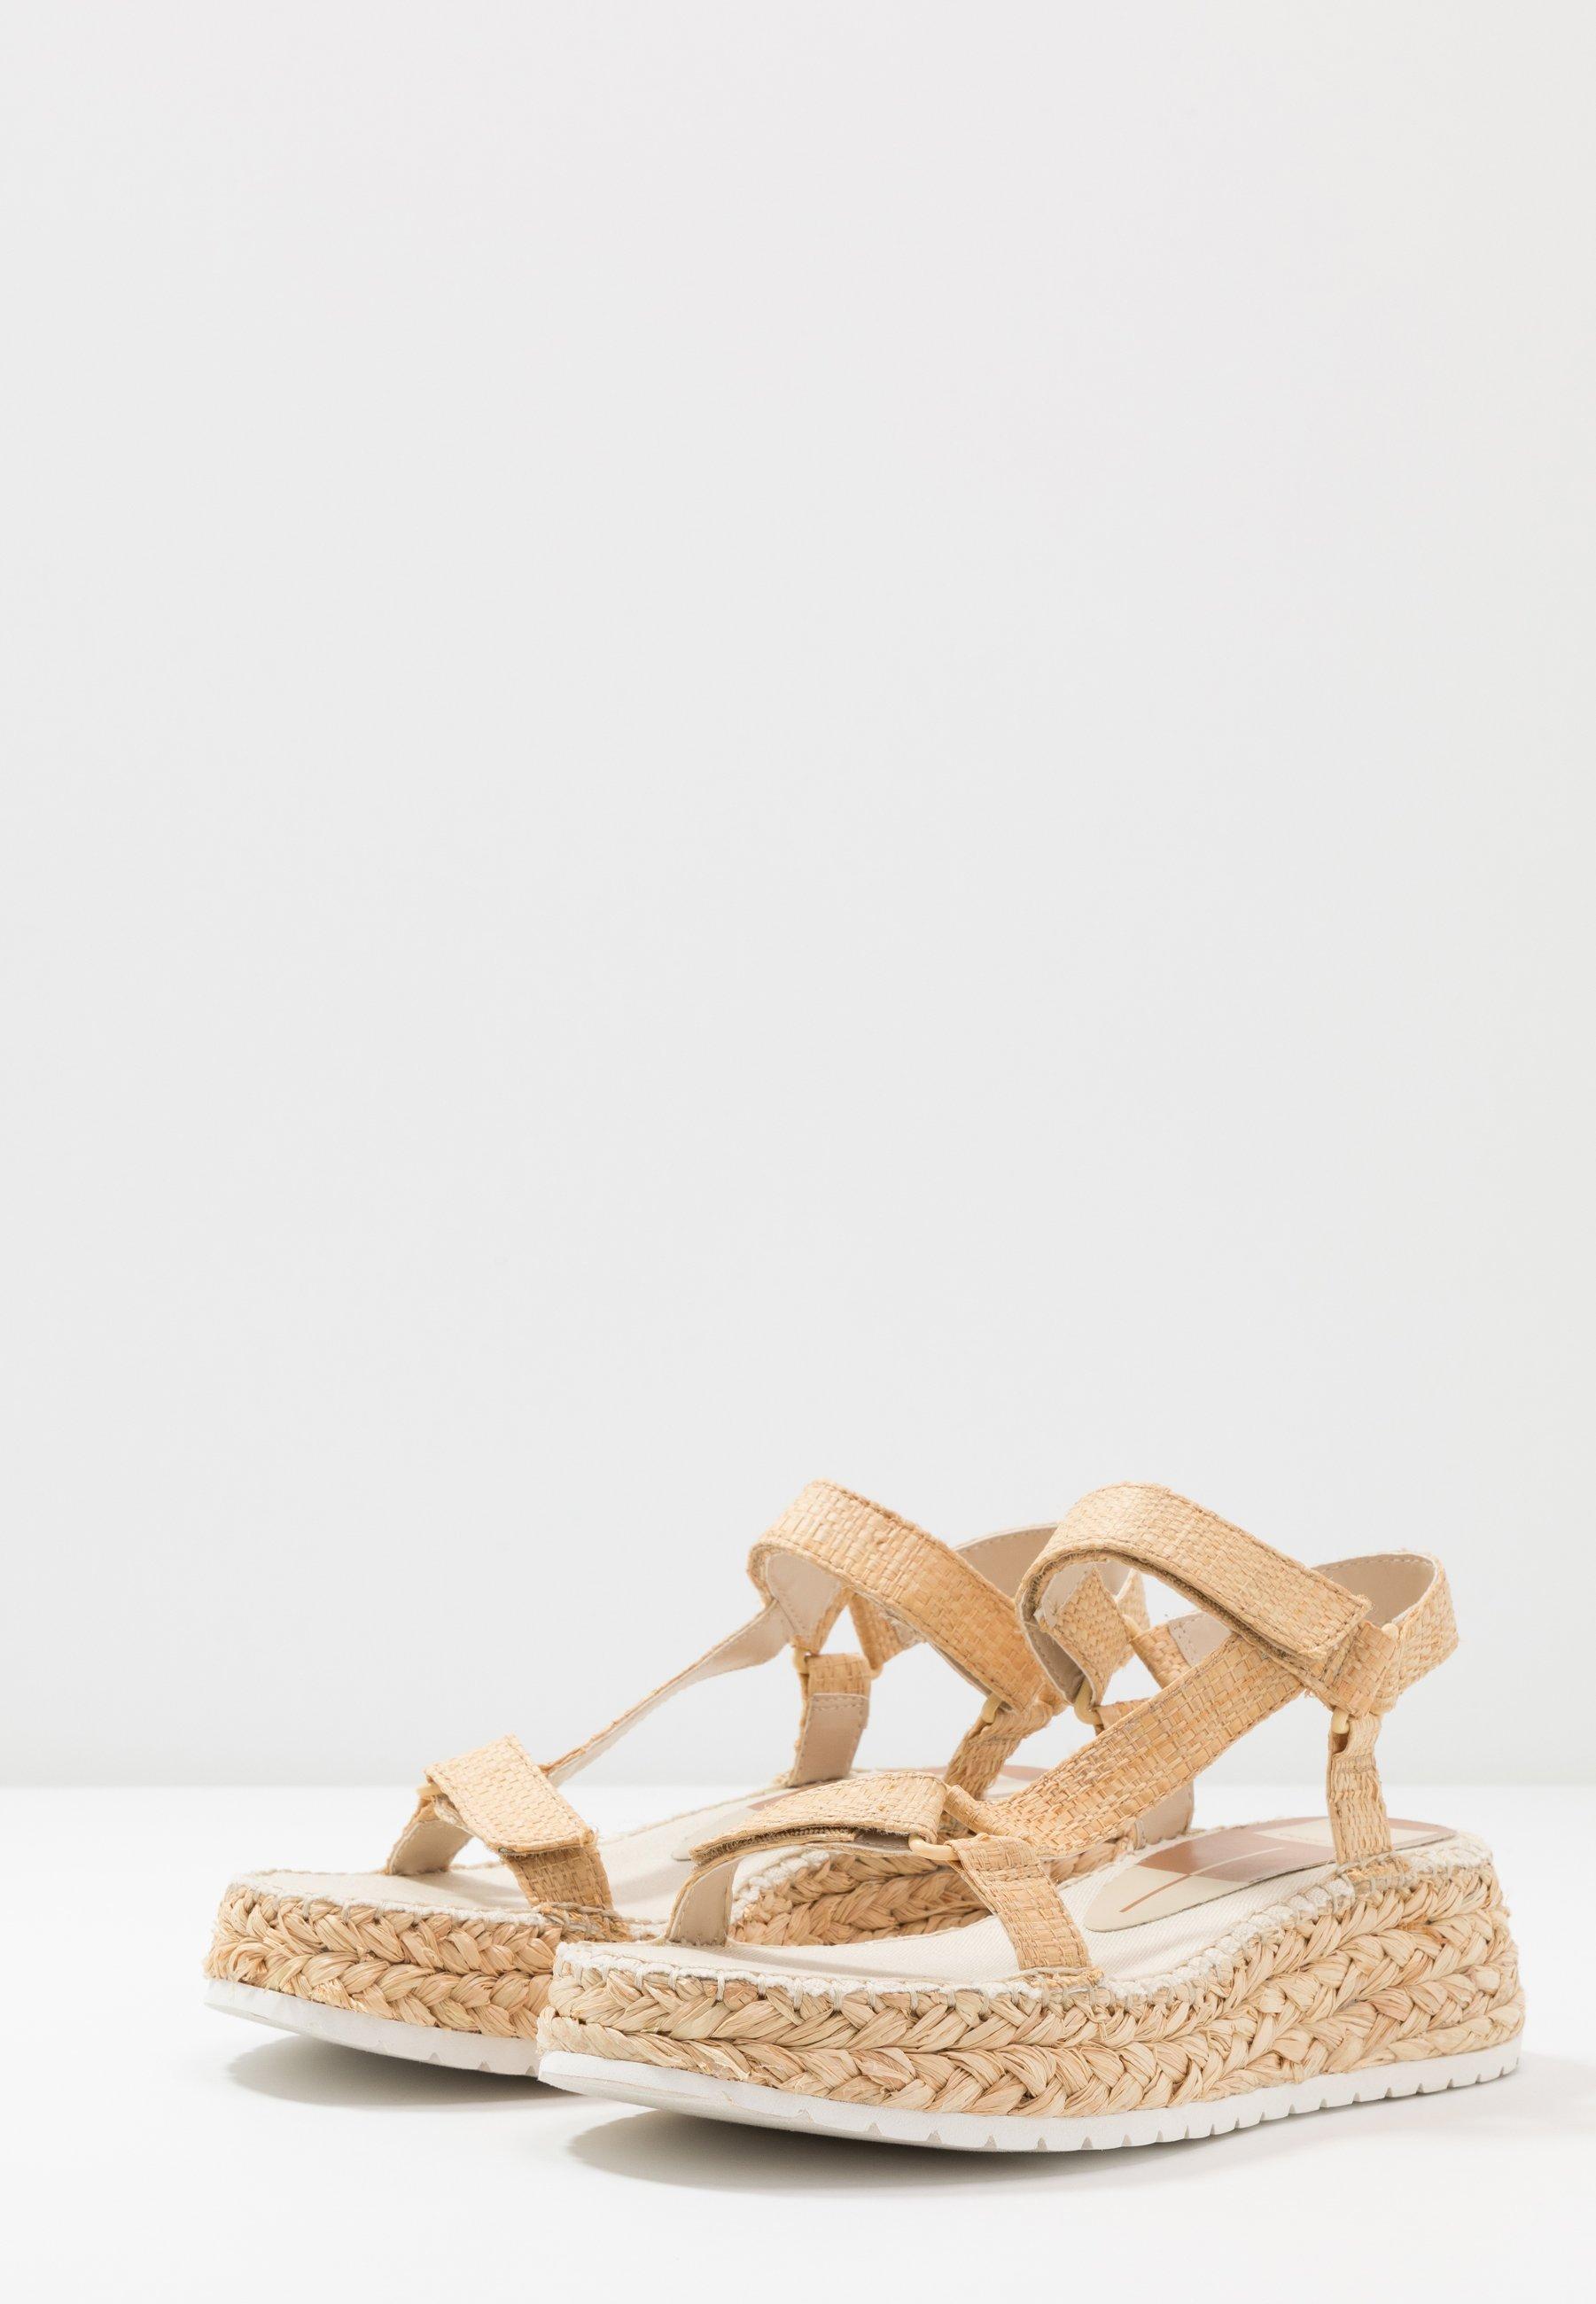 Dolce Vita MANO - Espadrilles - light natural - Sandales & Nu-pieds femme Classique